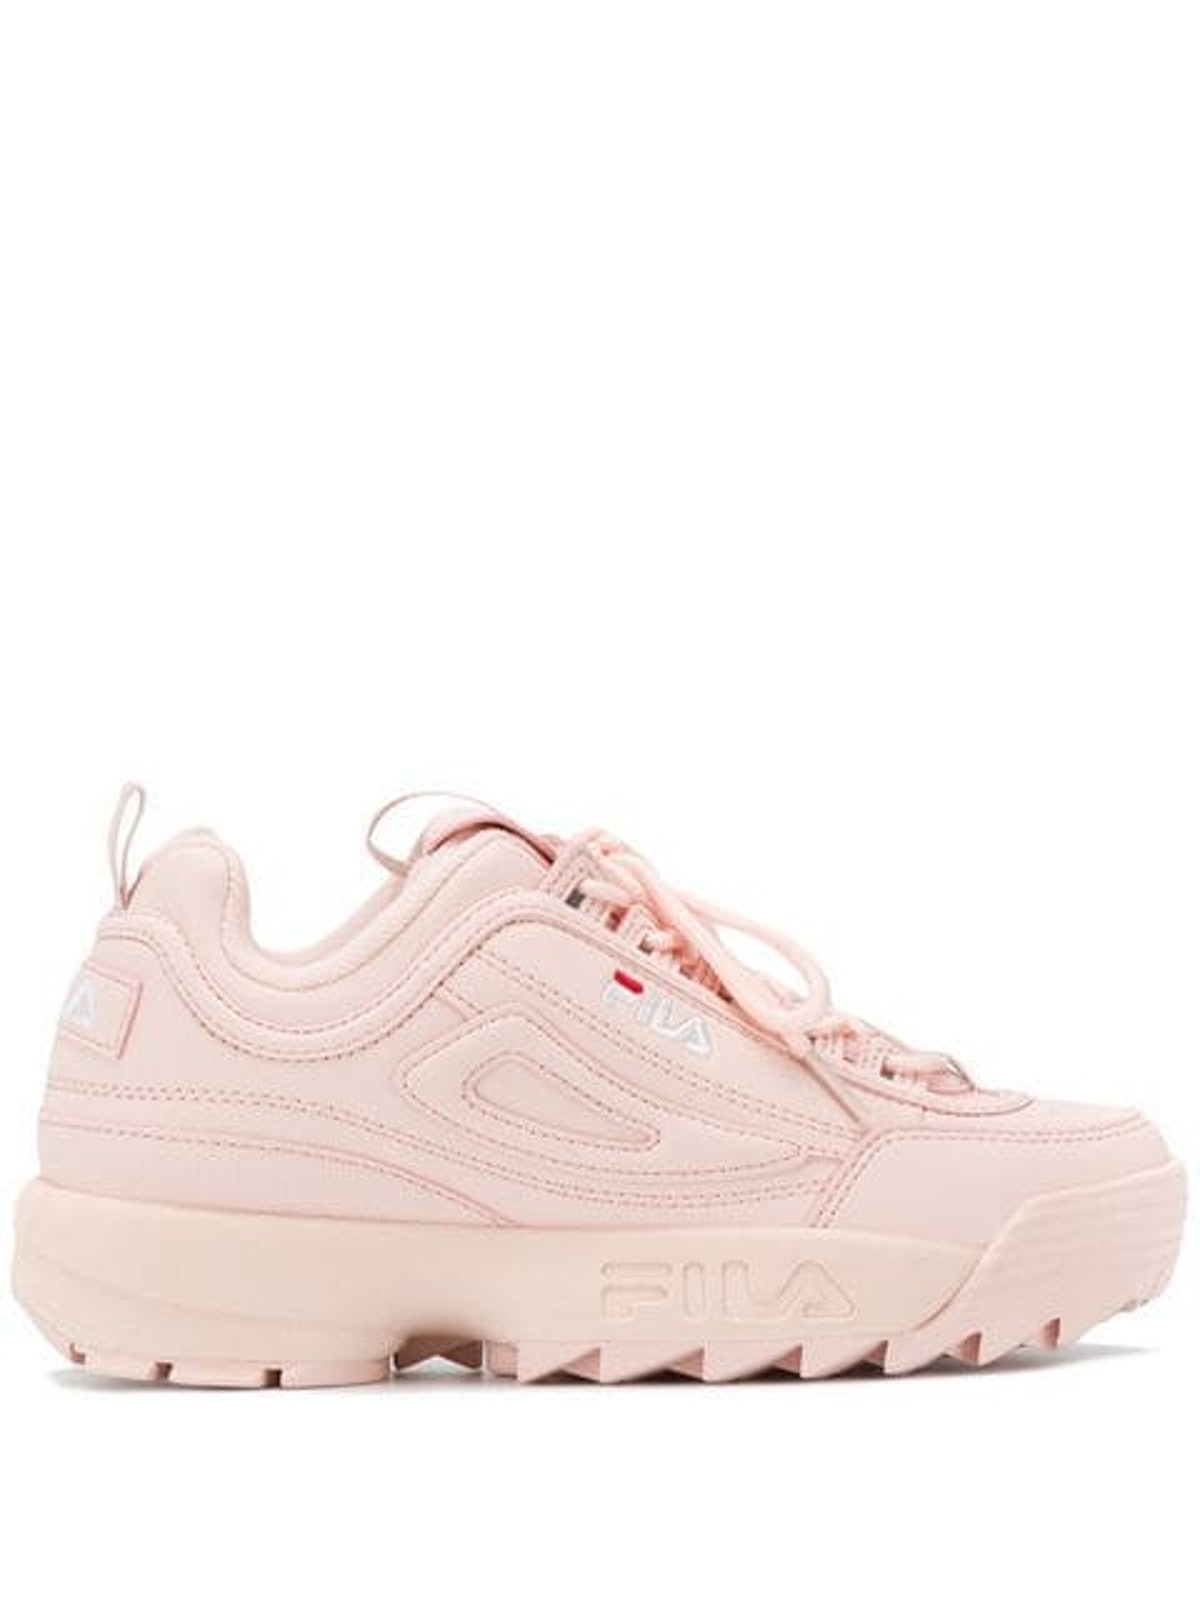 FILA chunky sole sneakers